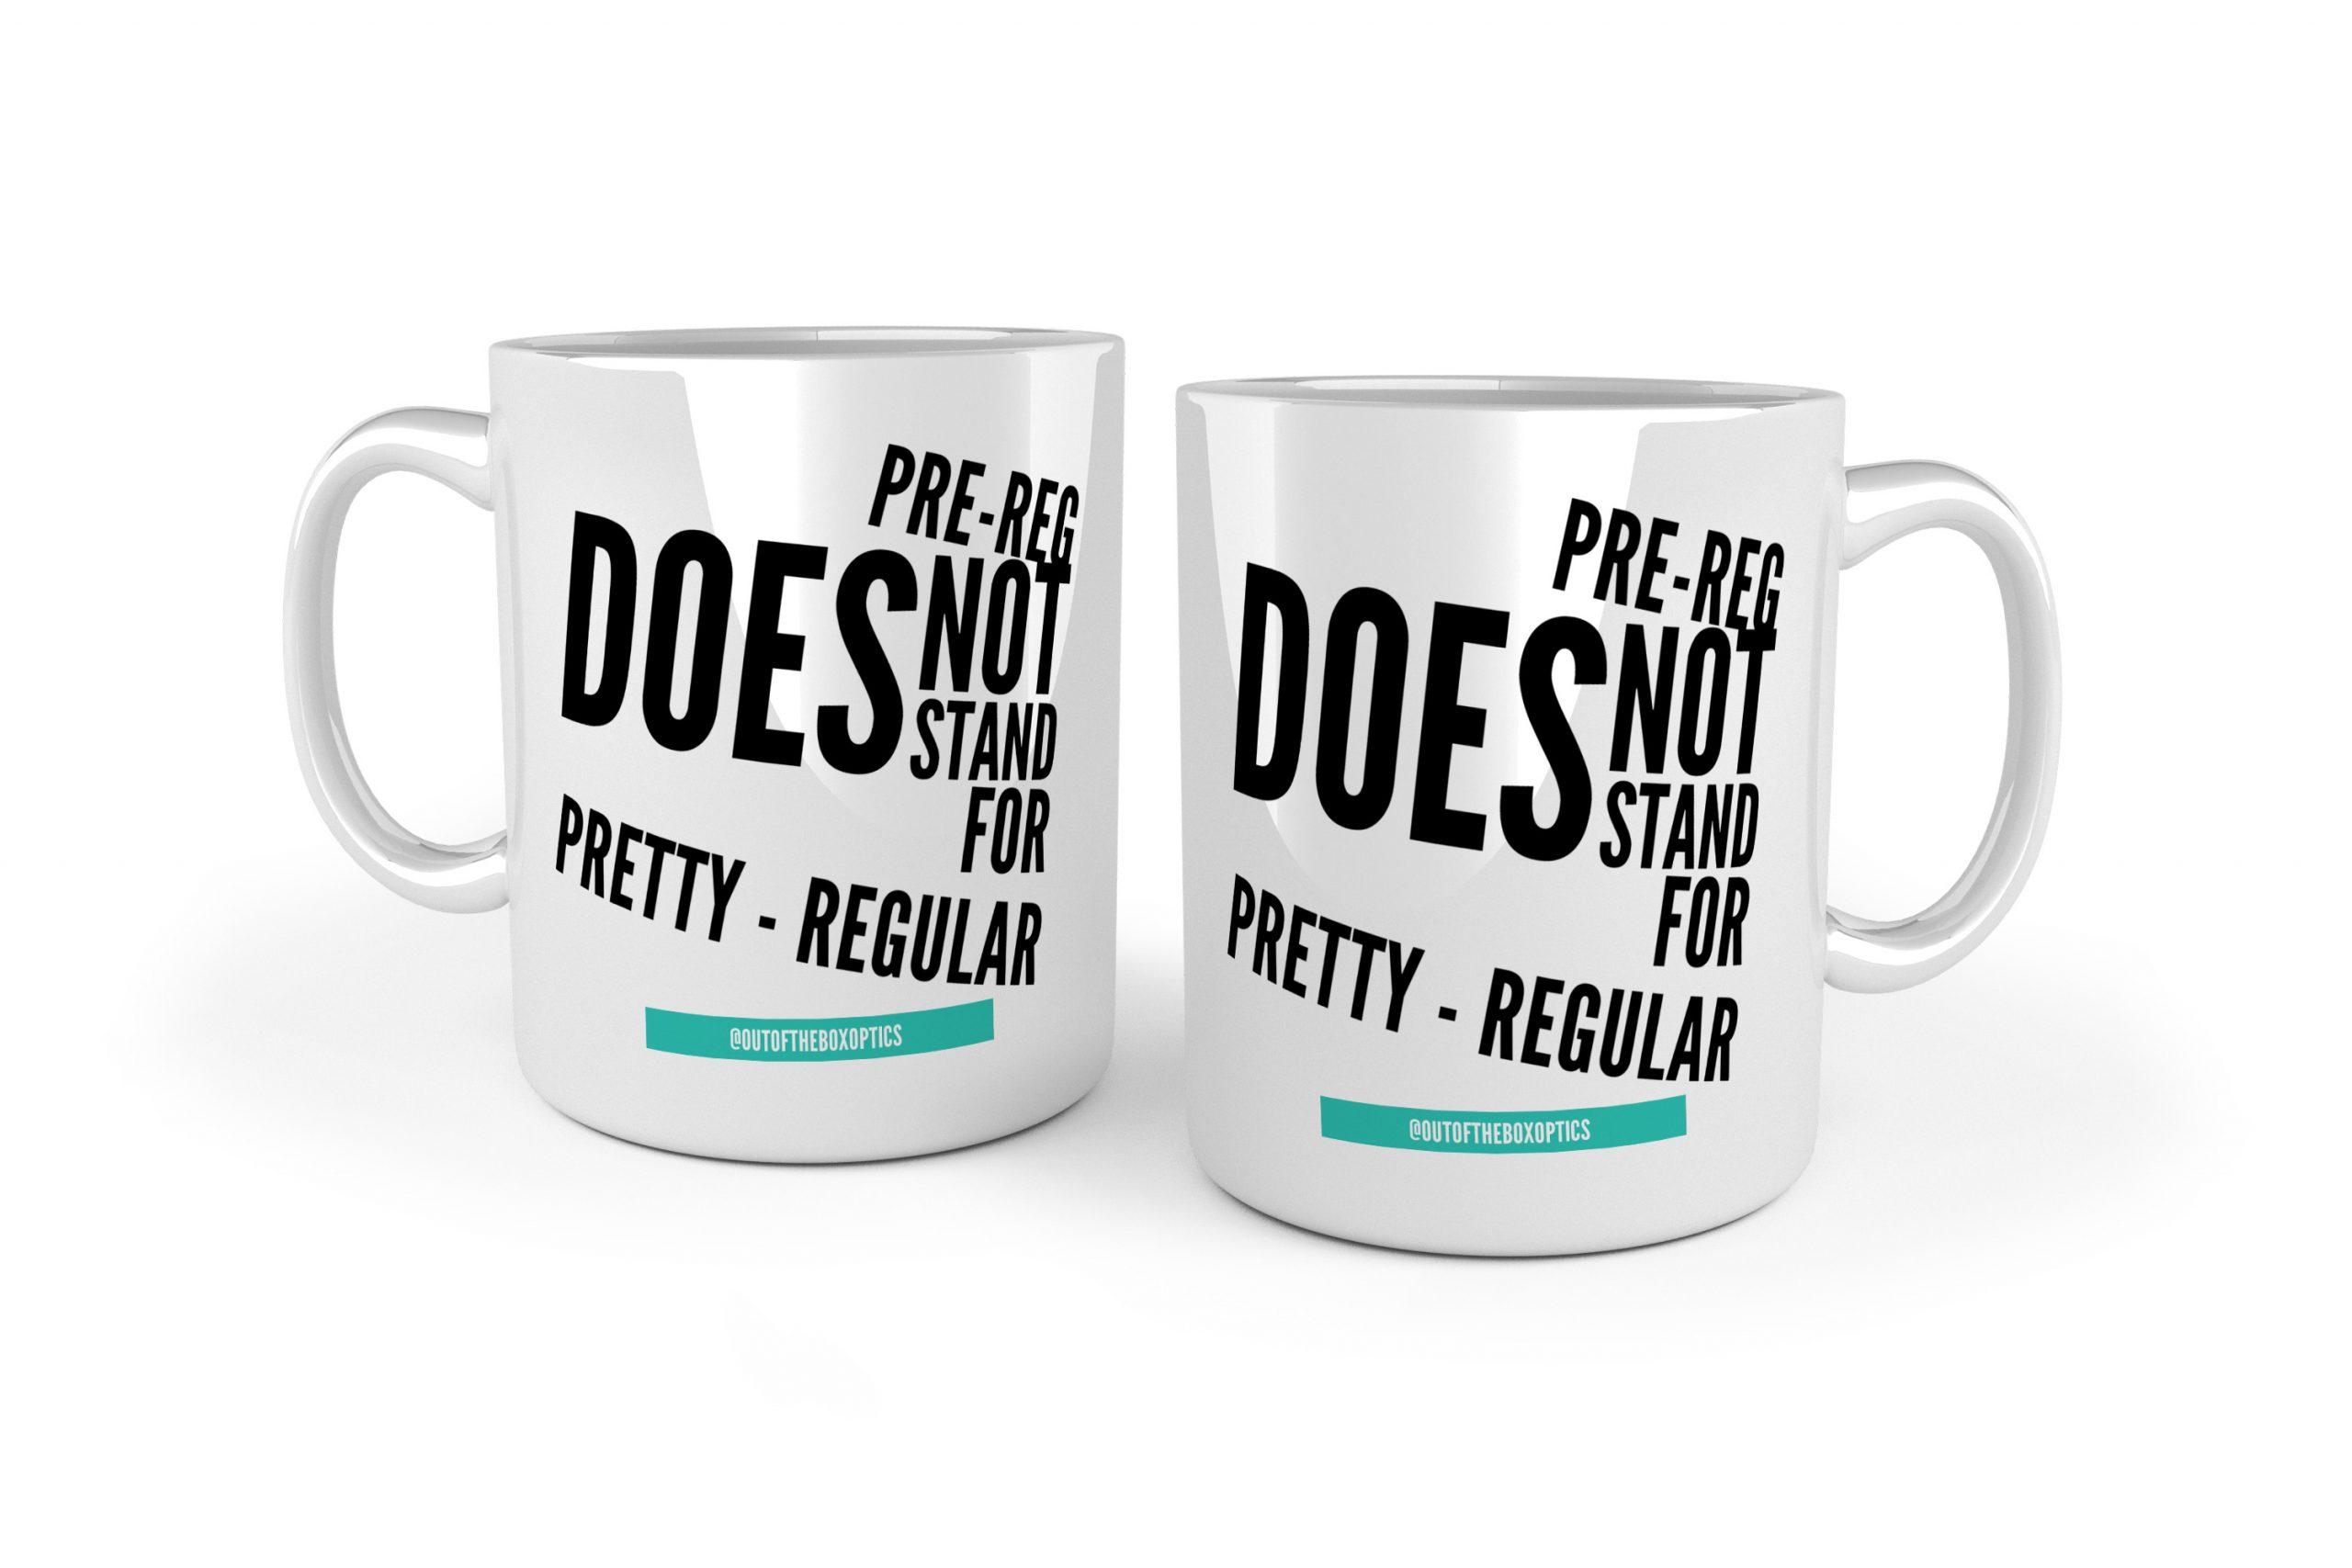 Not Pretty-Regular – Ceramic Mug